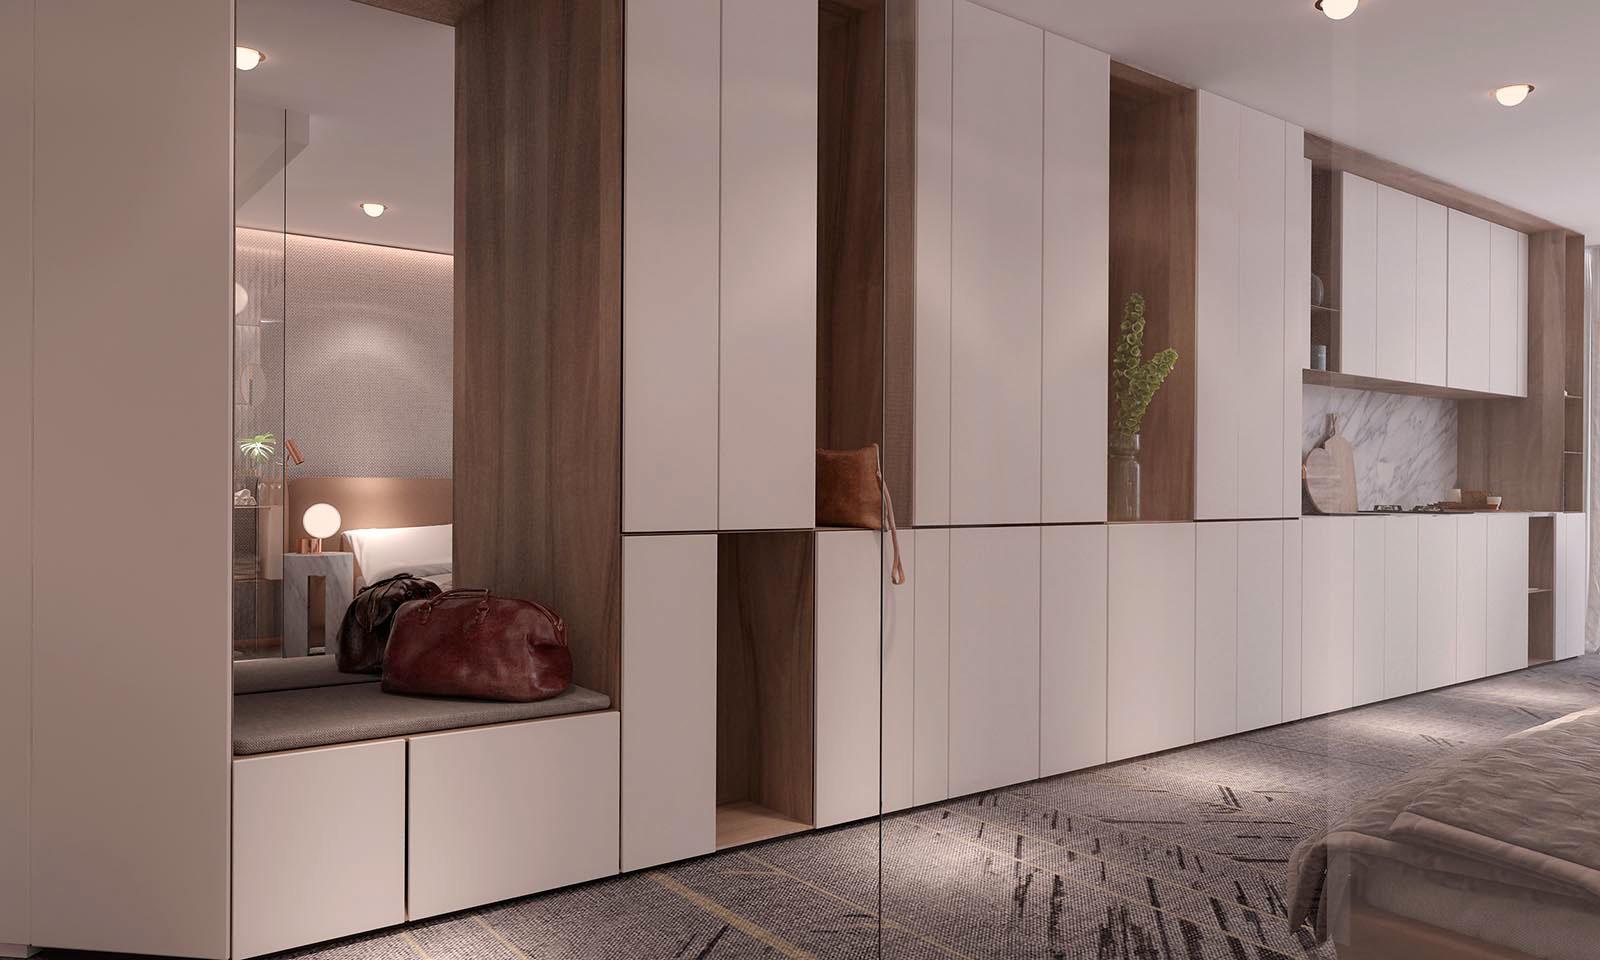 kastenwand-slaapkamer